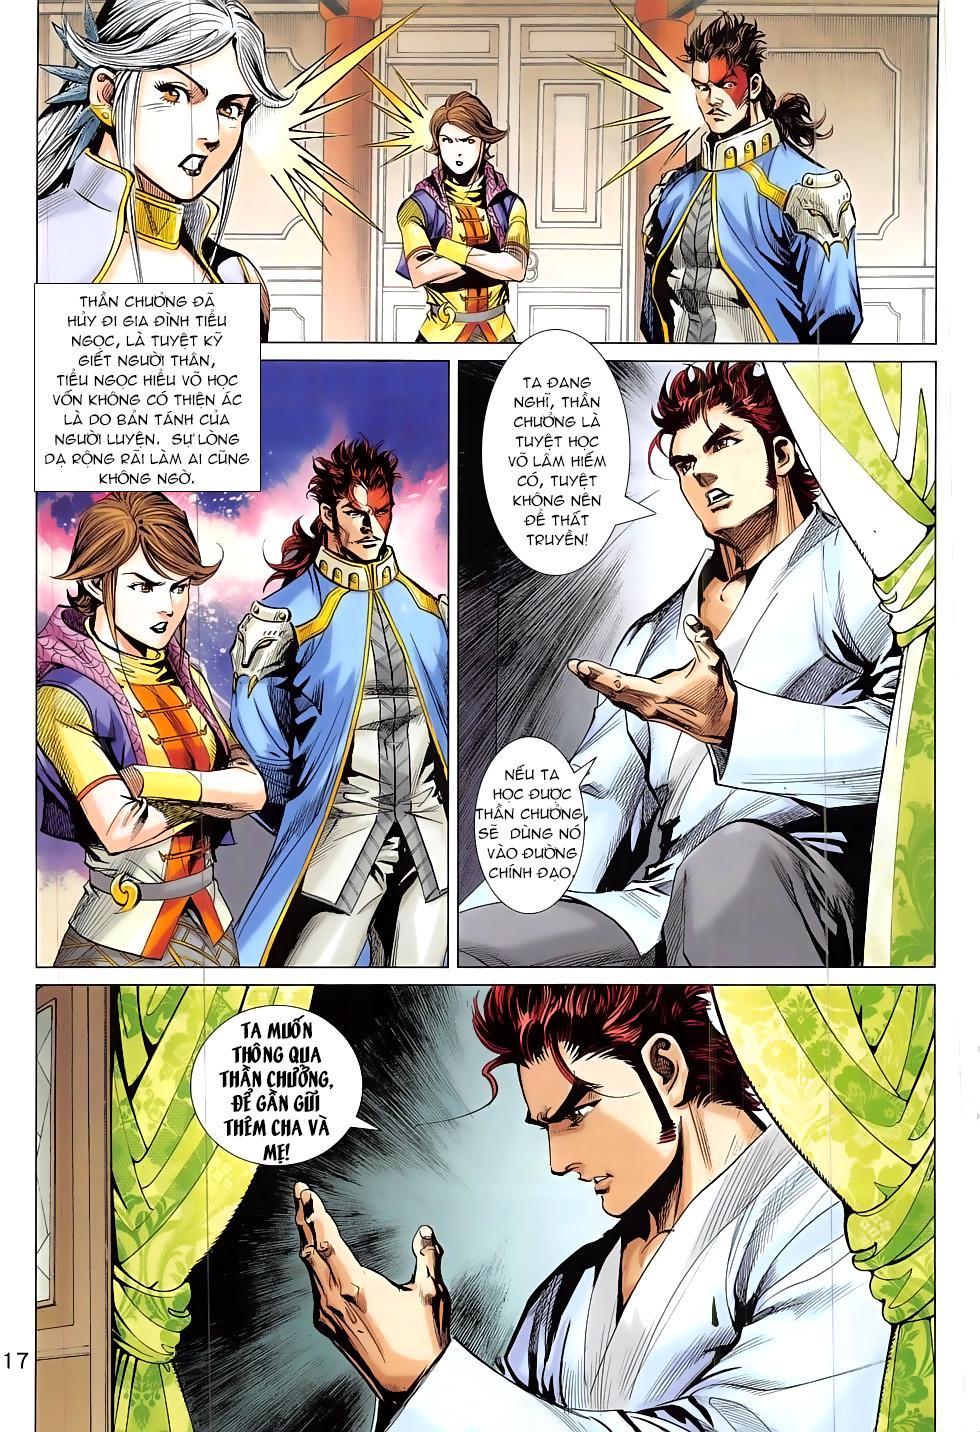 Thần Chưởng chap 24 – End Trang 17 - Mangak.info